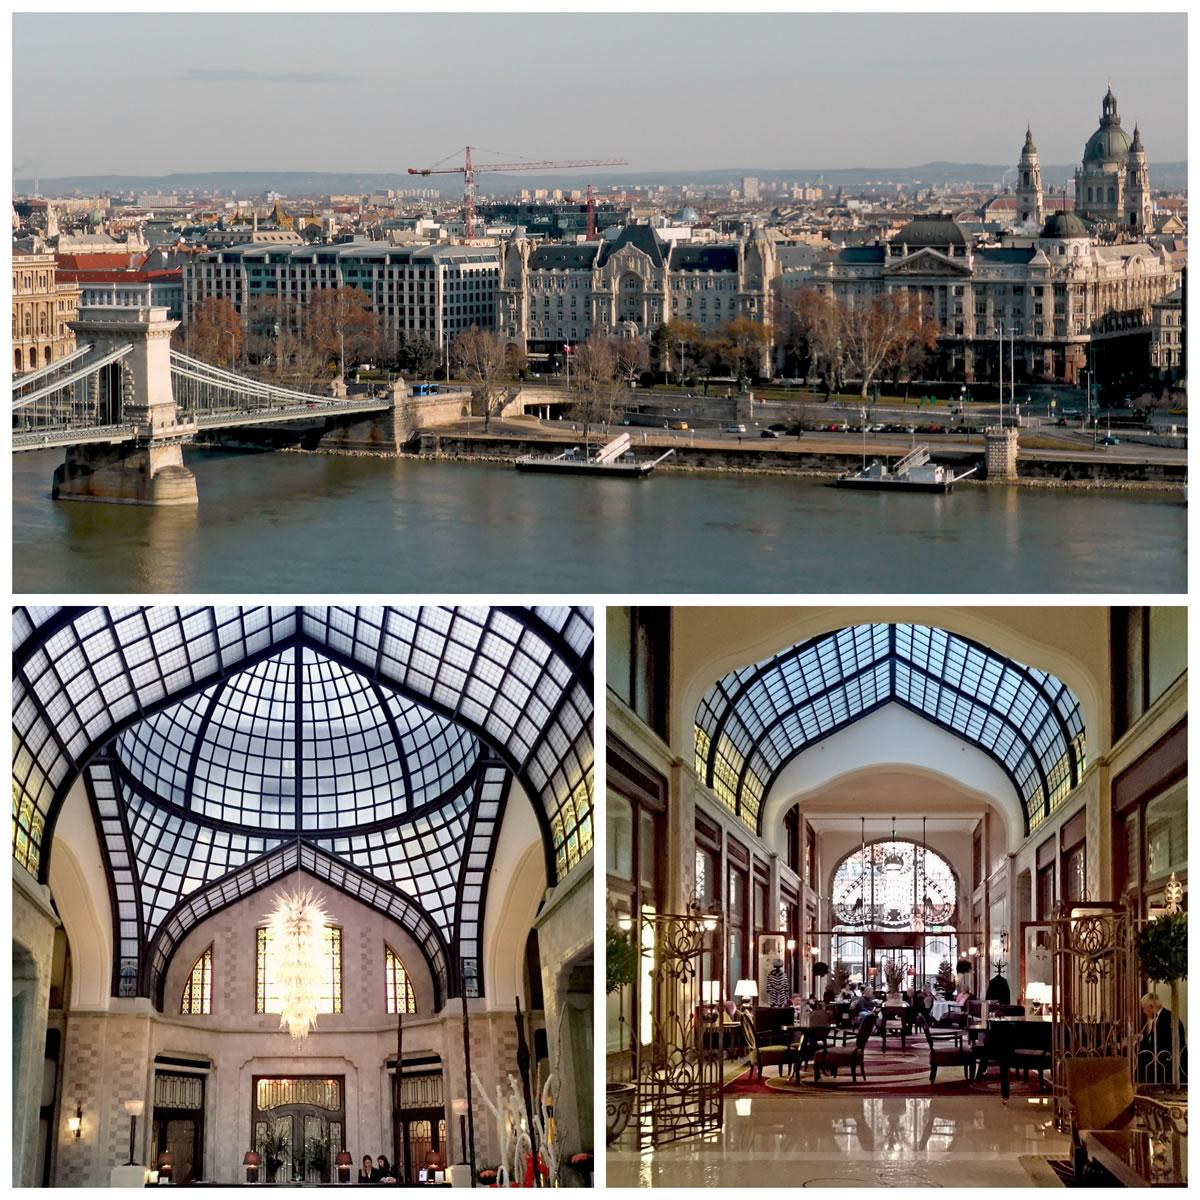 Pest-Palais-Gresham-Budapest